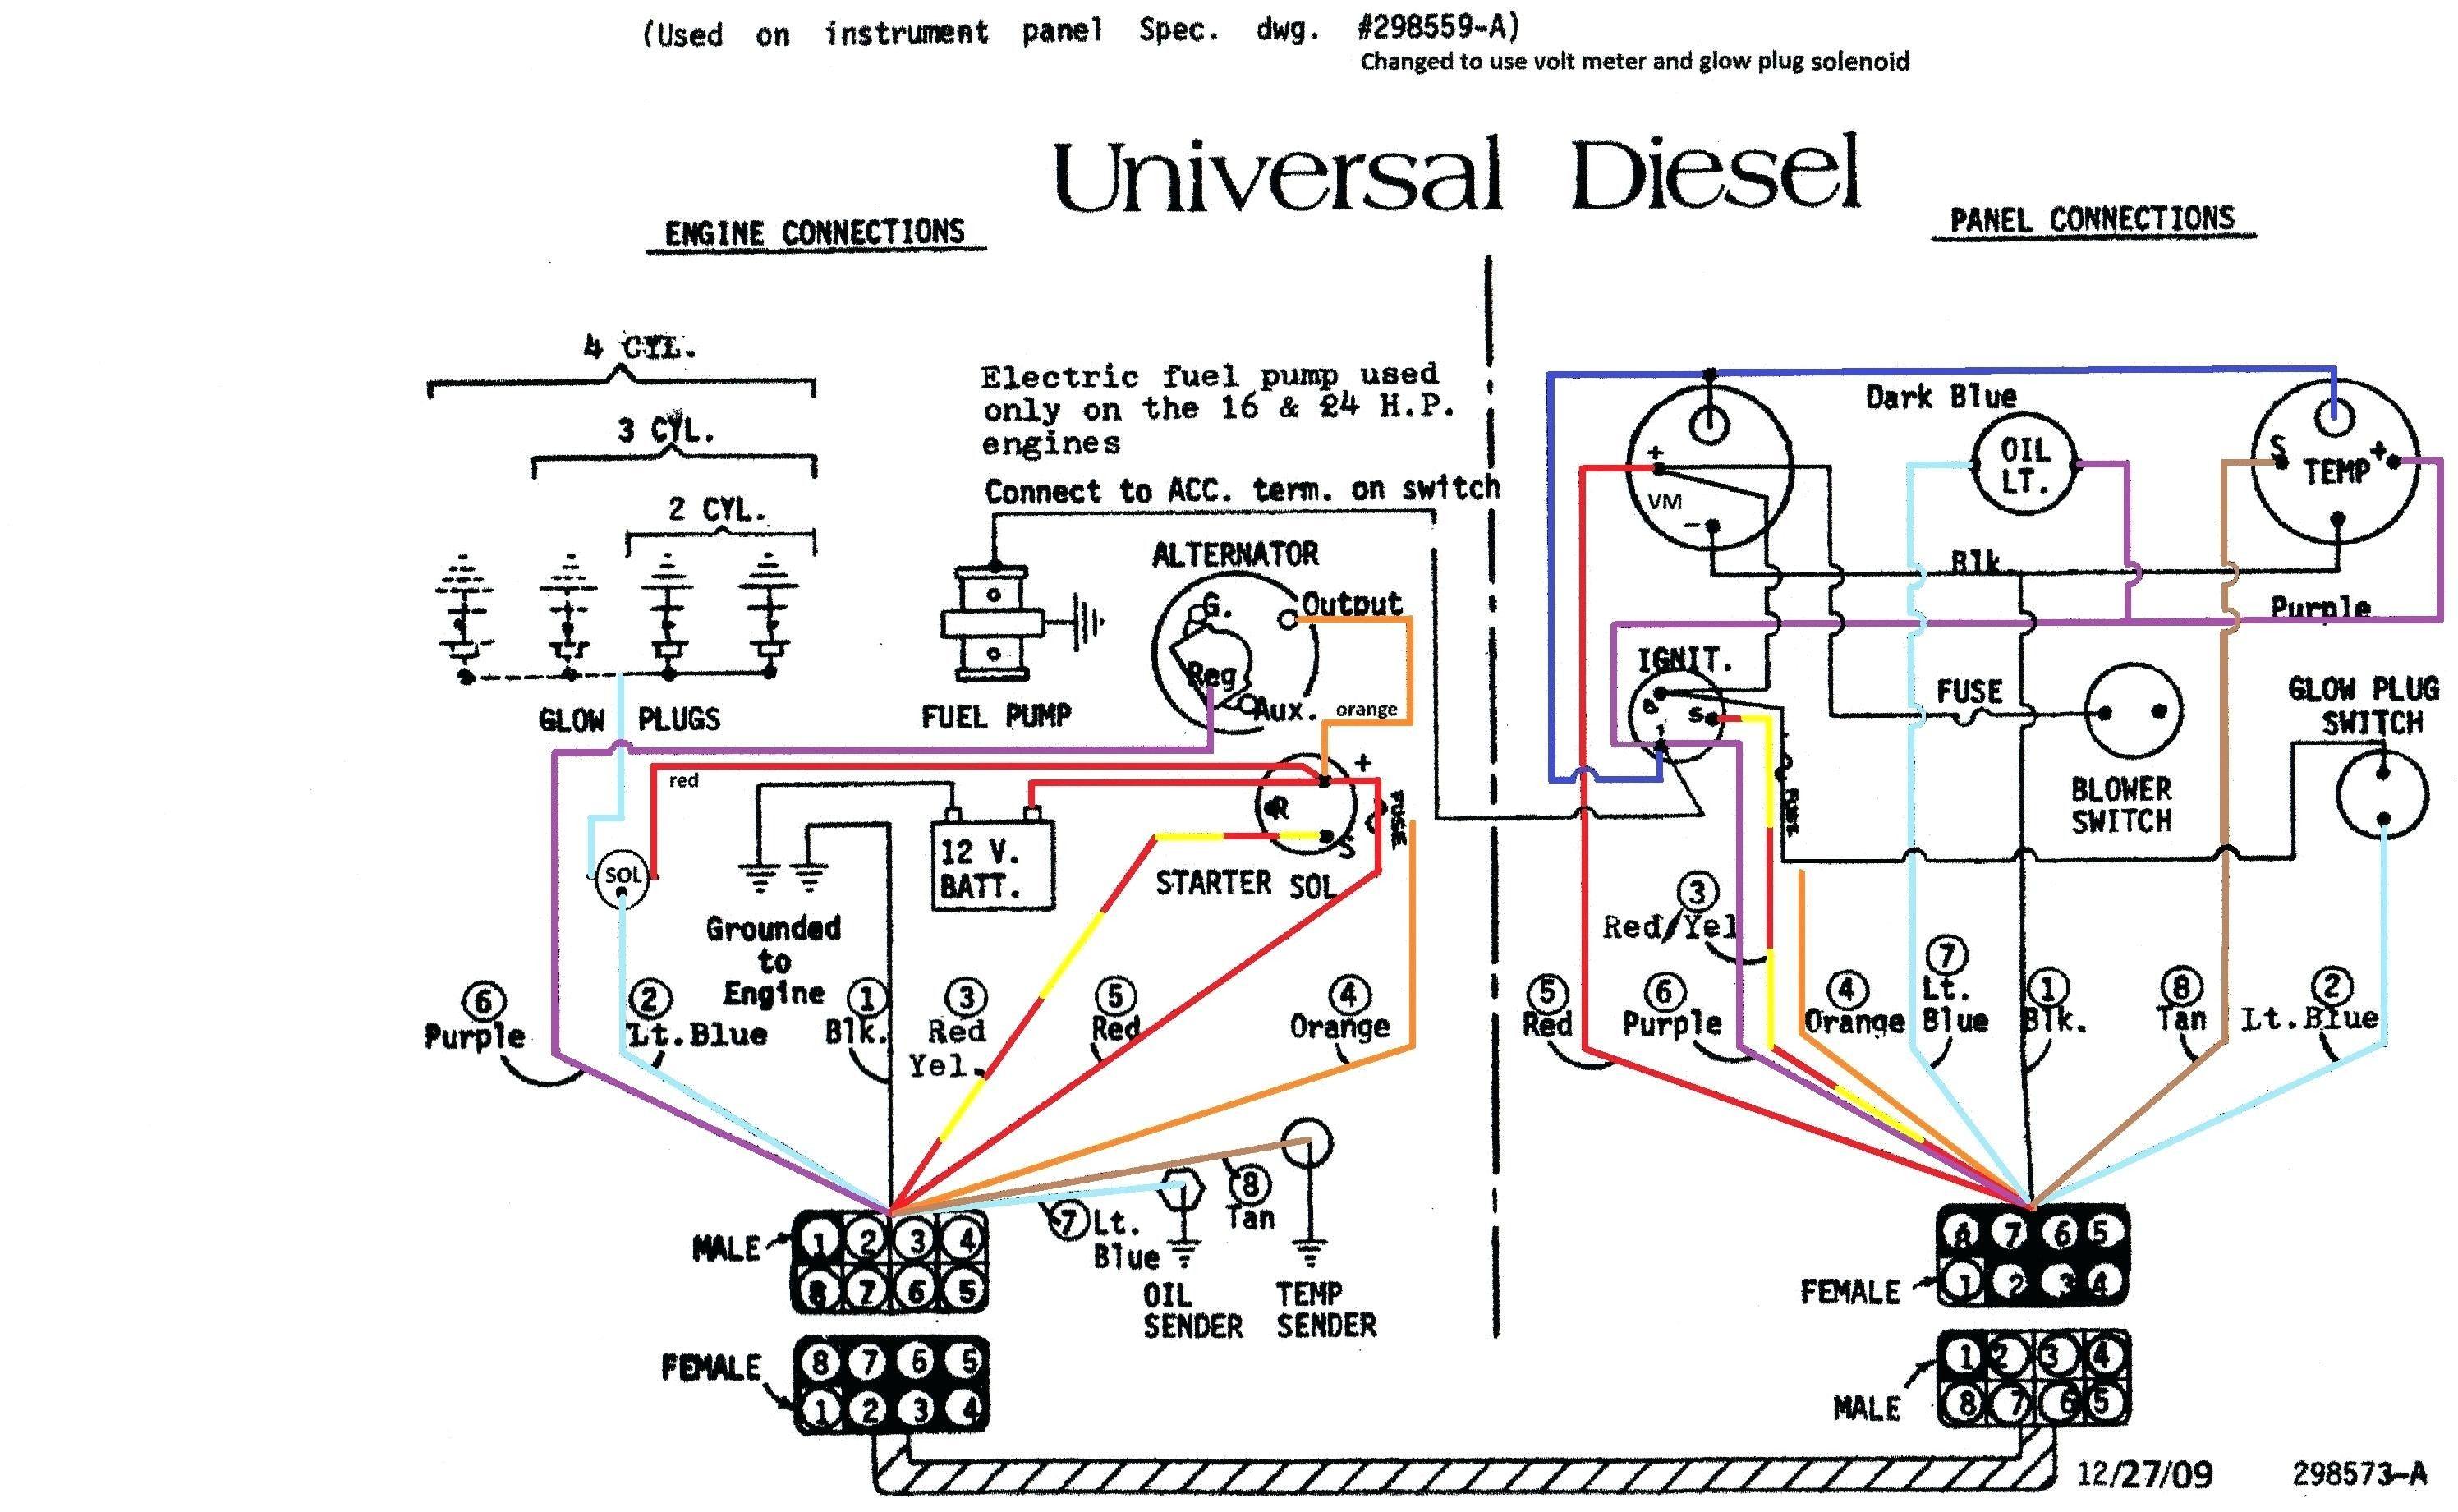 New Wiring Diagram Program diagram wiringdiagram